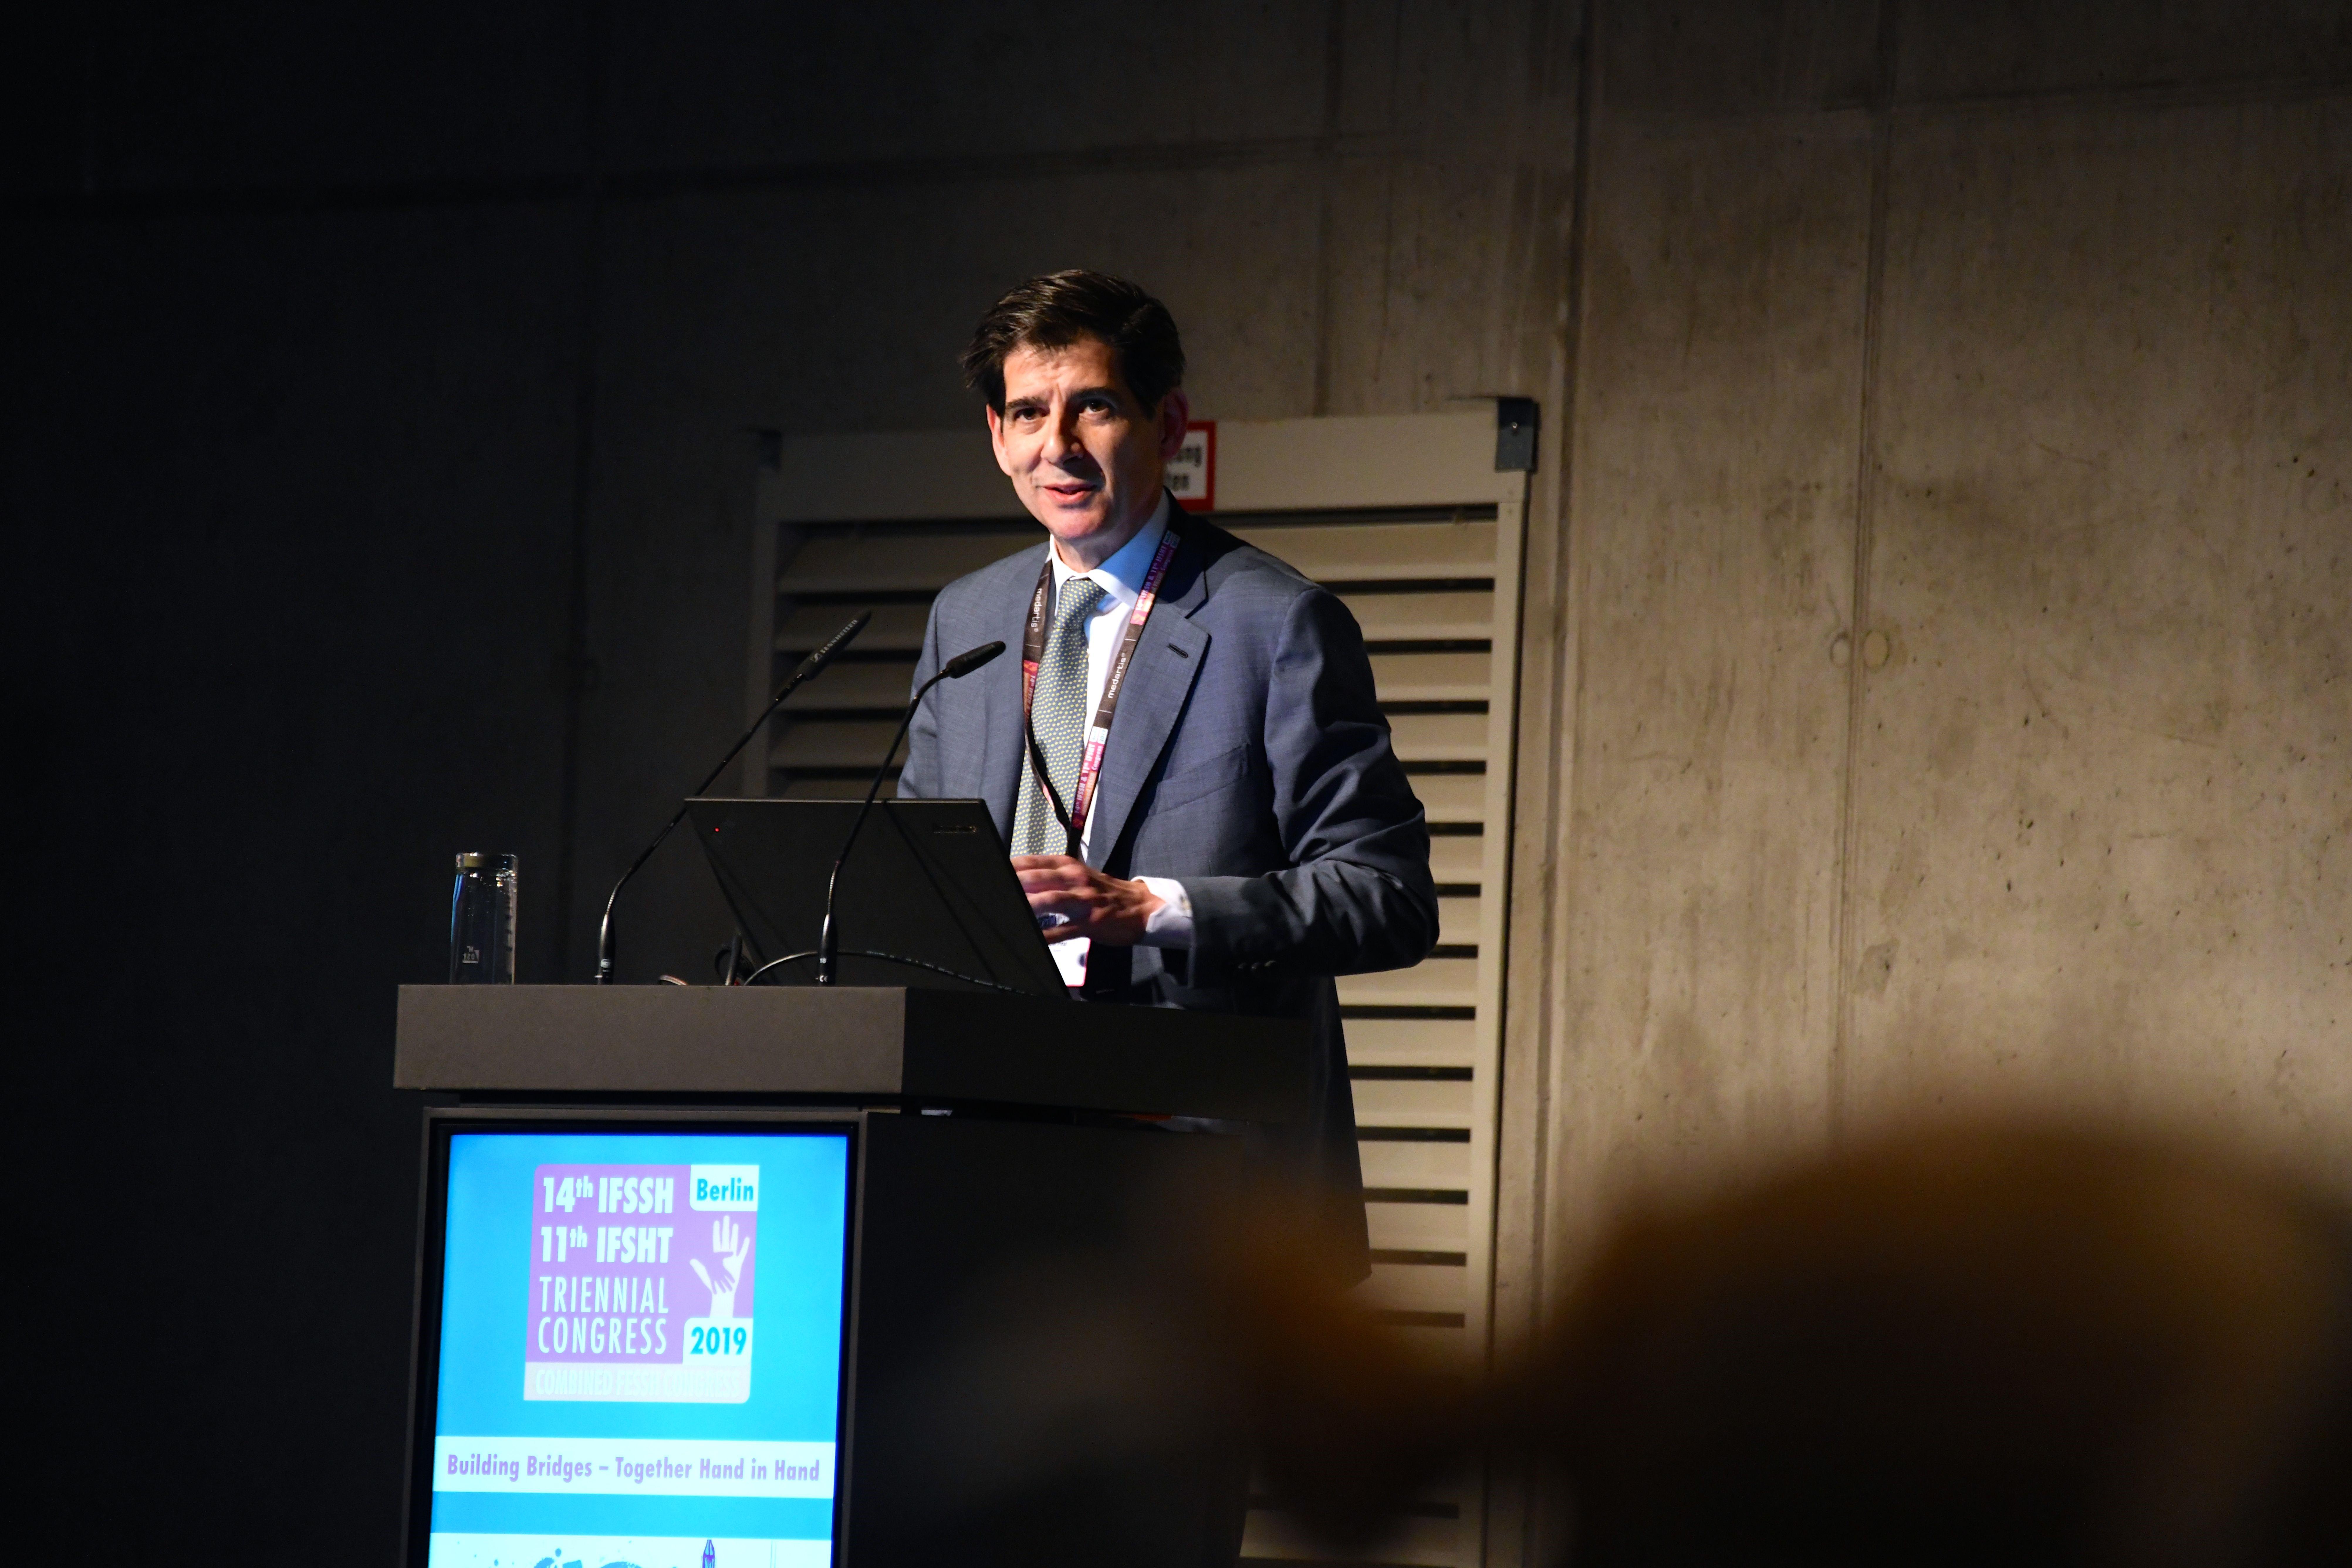 Congreso Mundial IFSSH_Berlin_02_201906